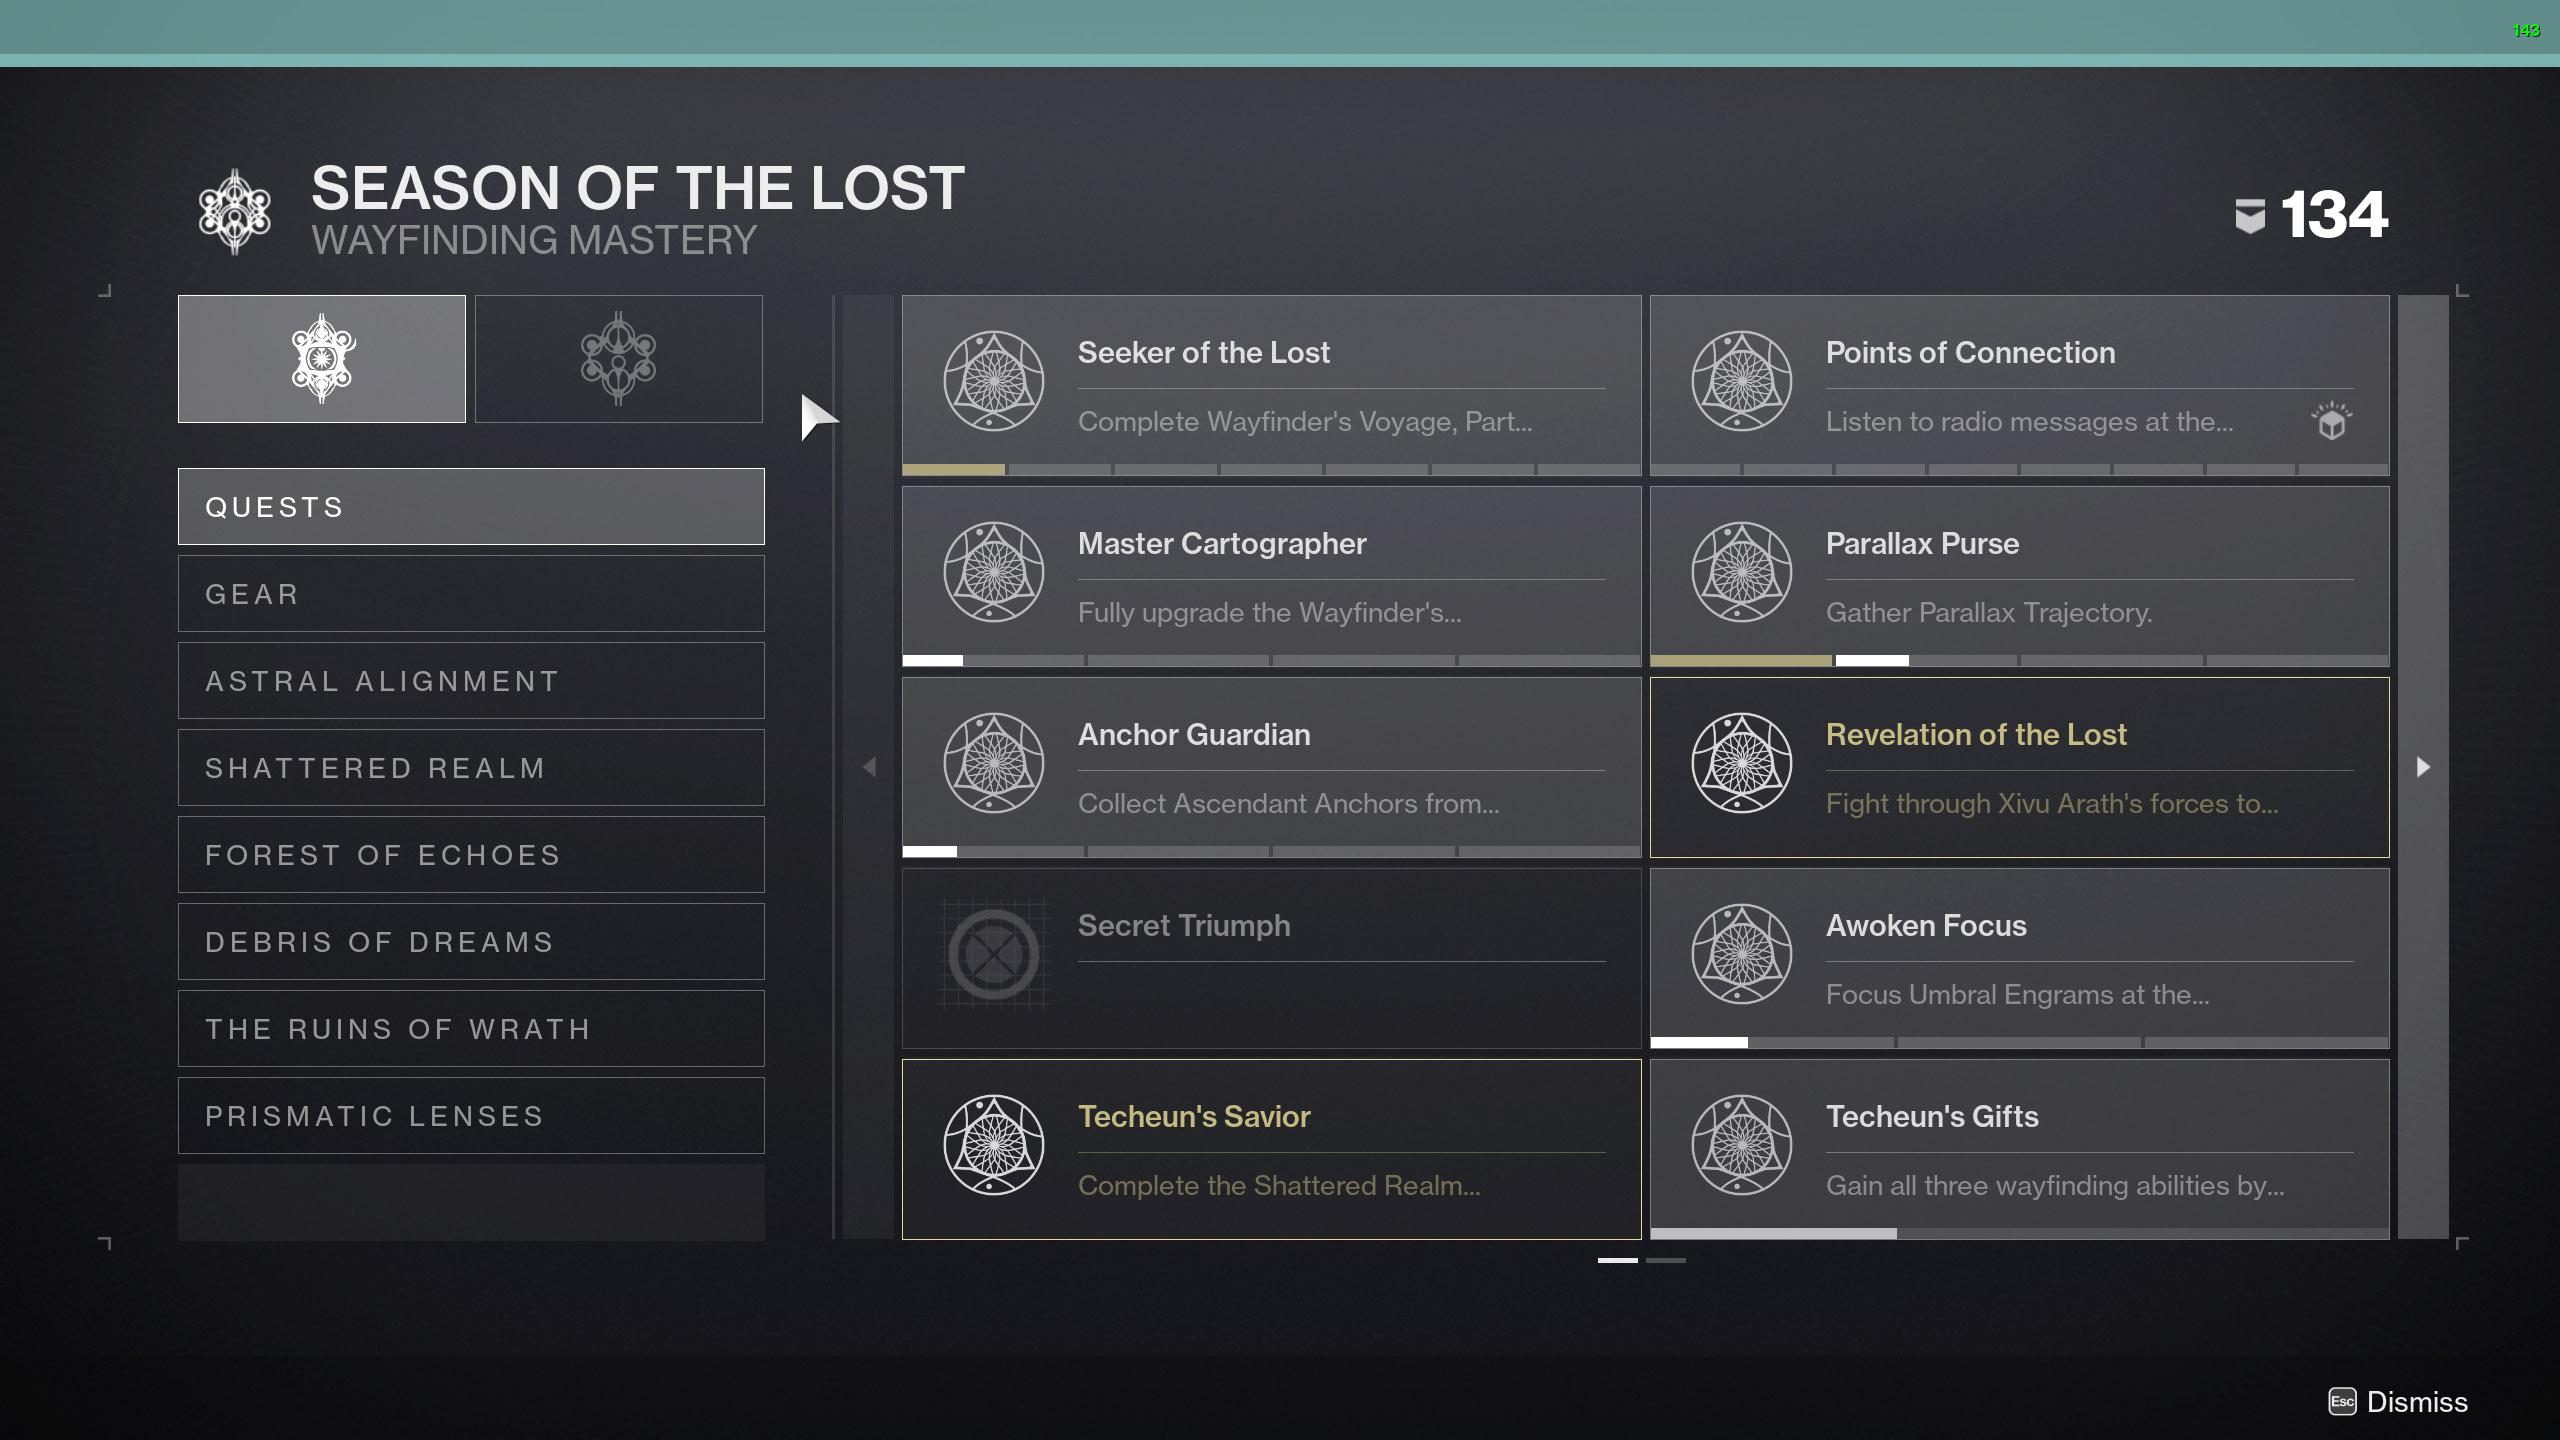 destiny 2 season of the lost triumphs